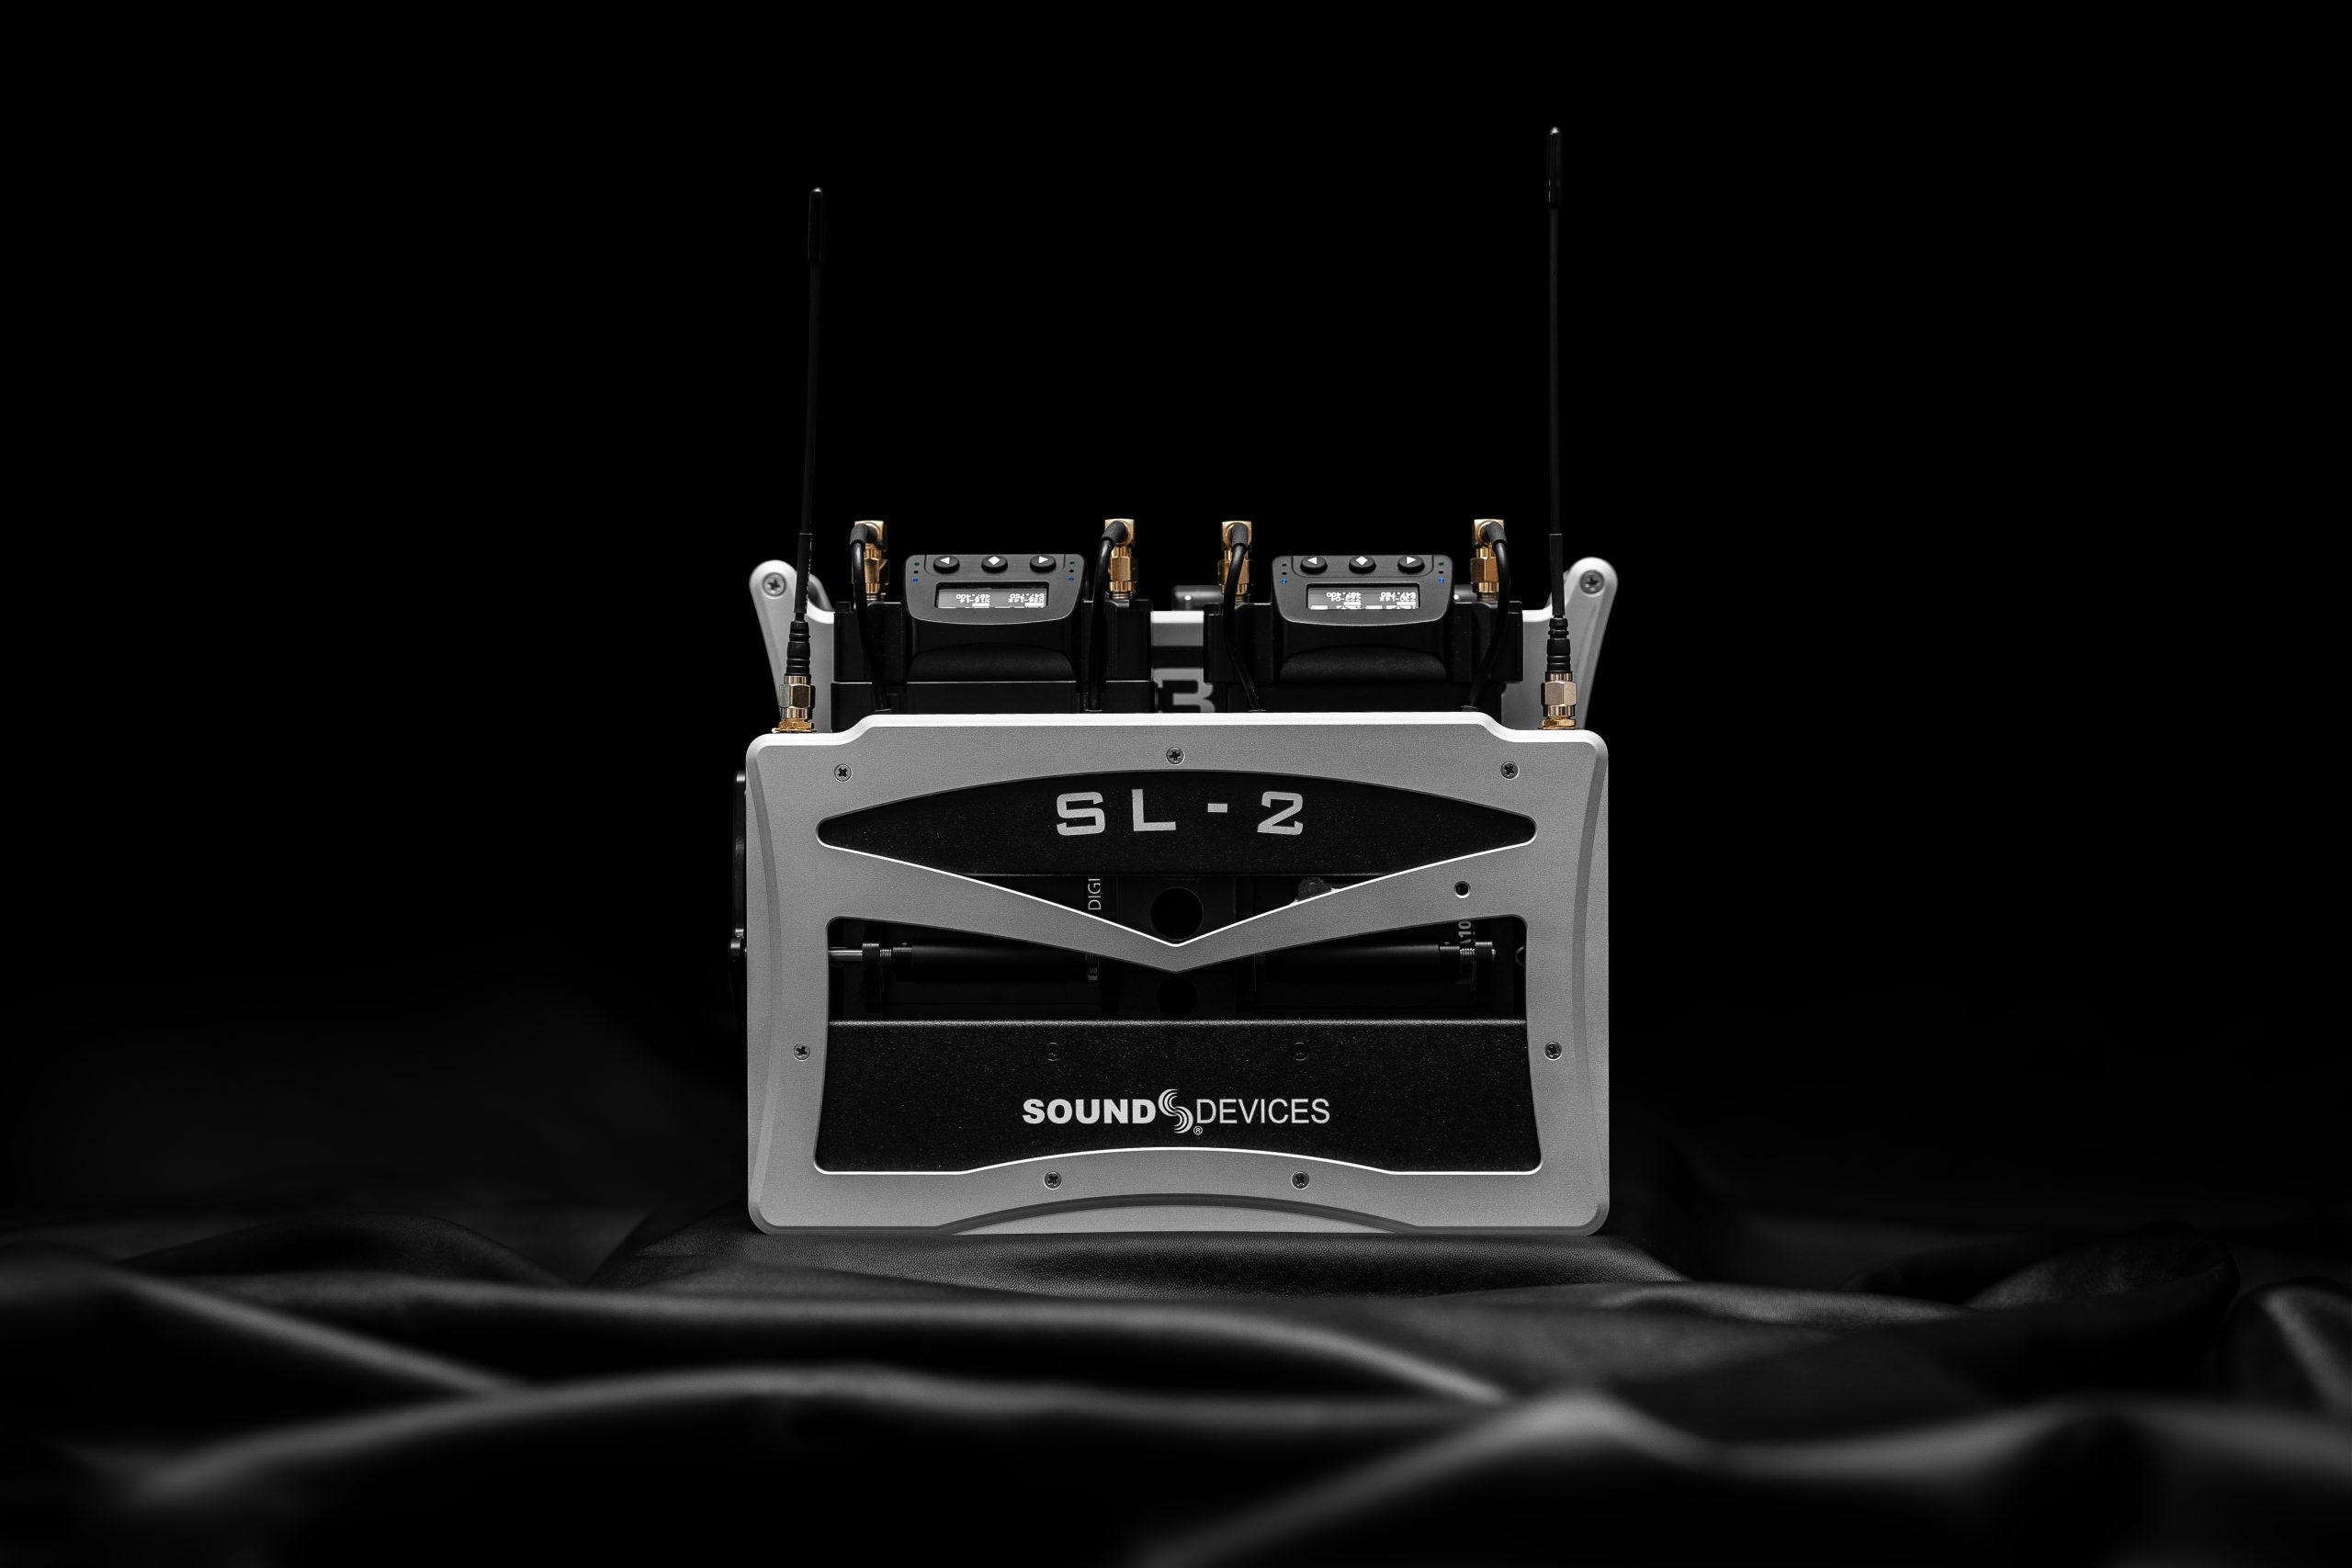 Sound DevicesがSL-2 Wireless Moduleを発売